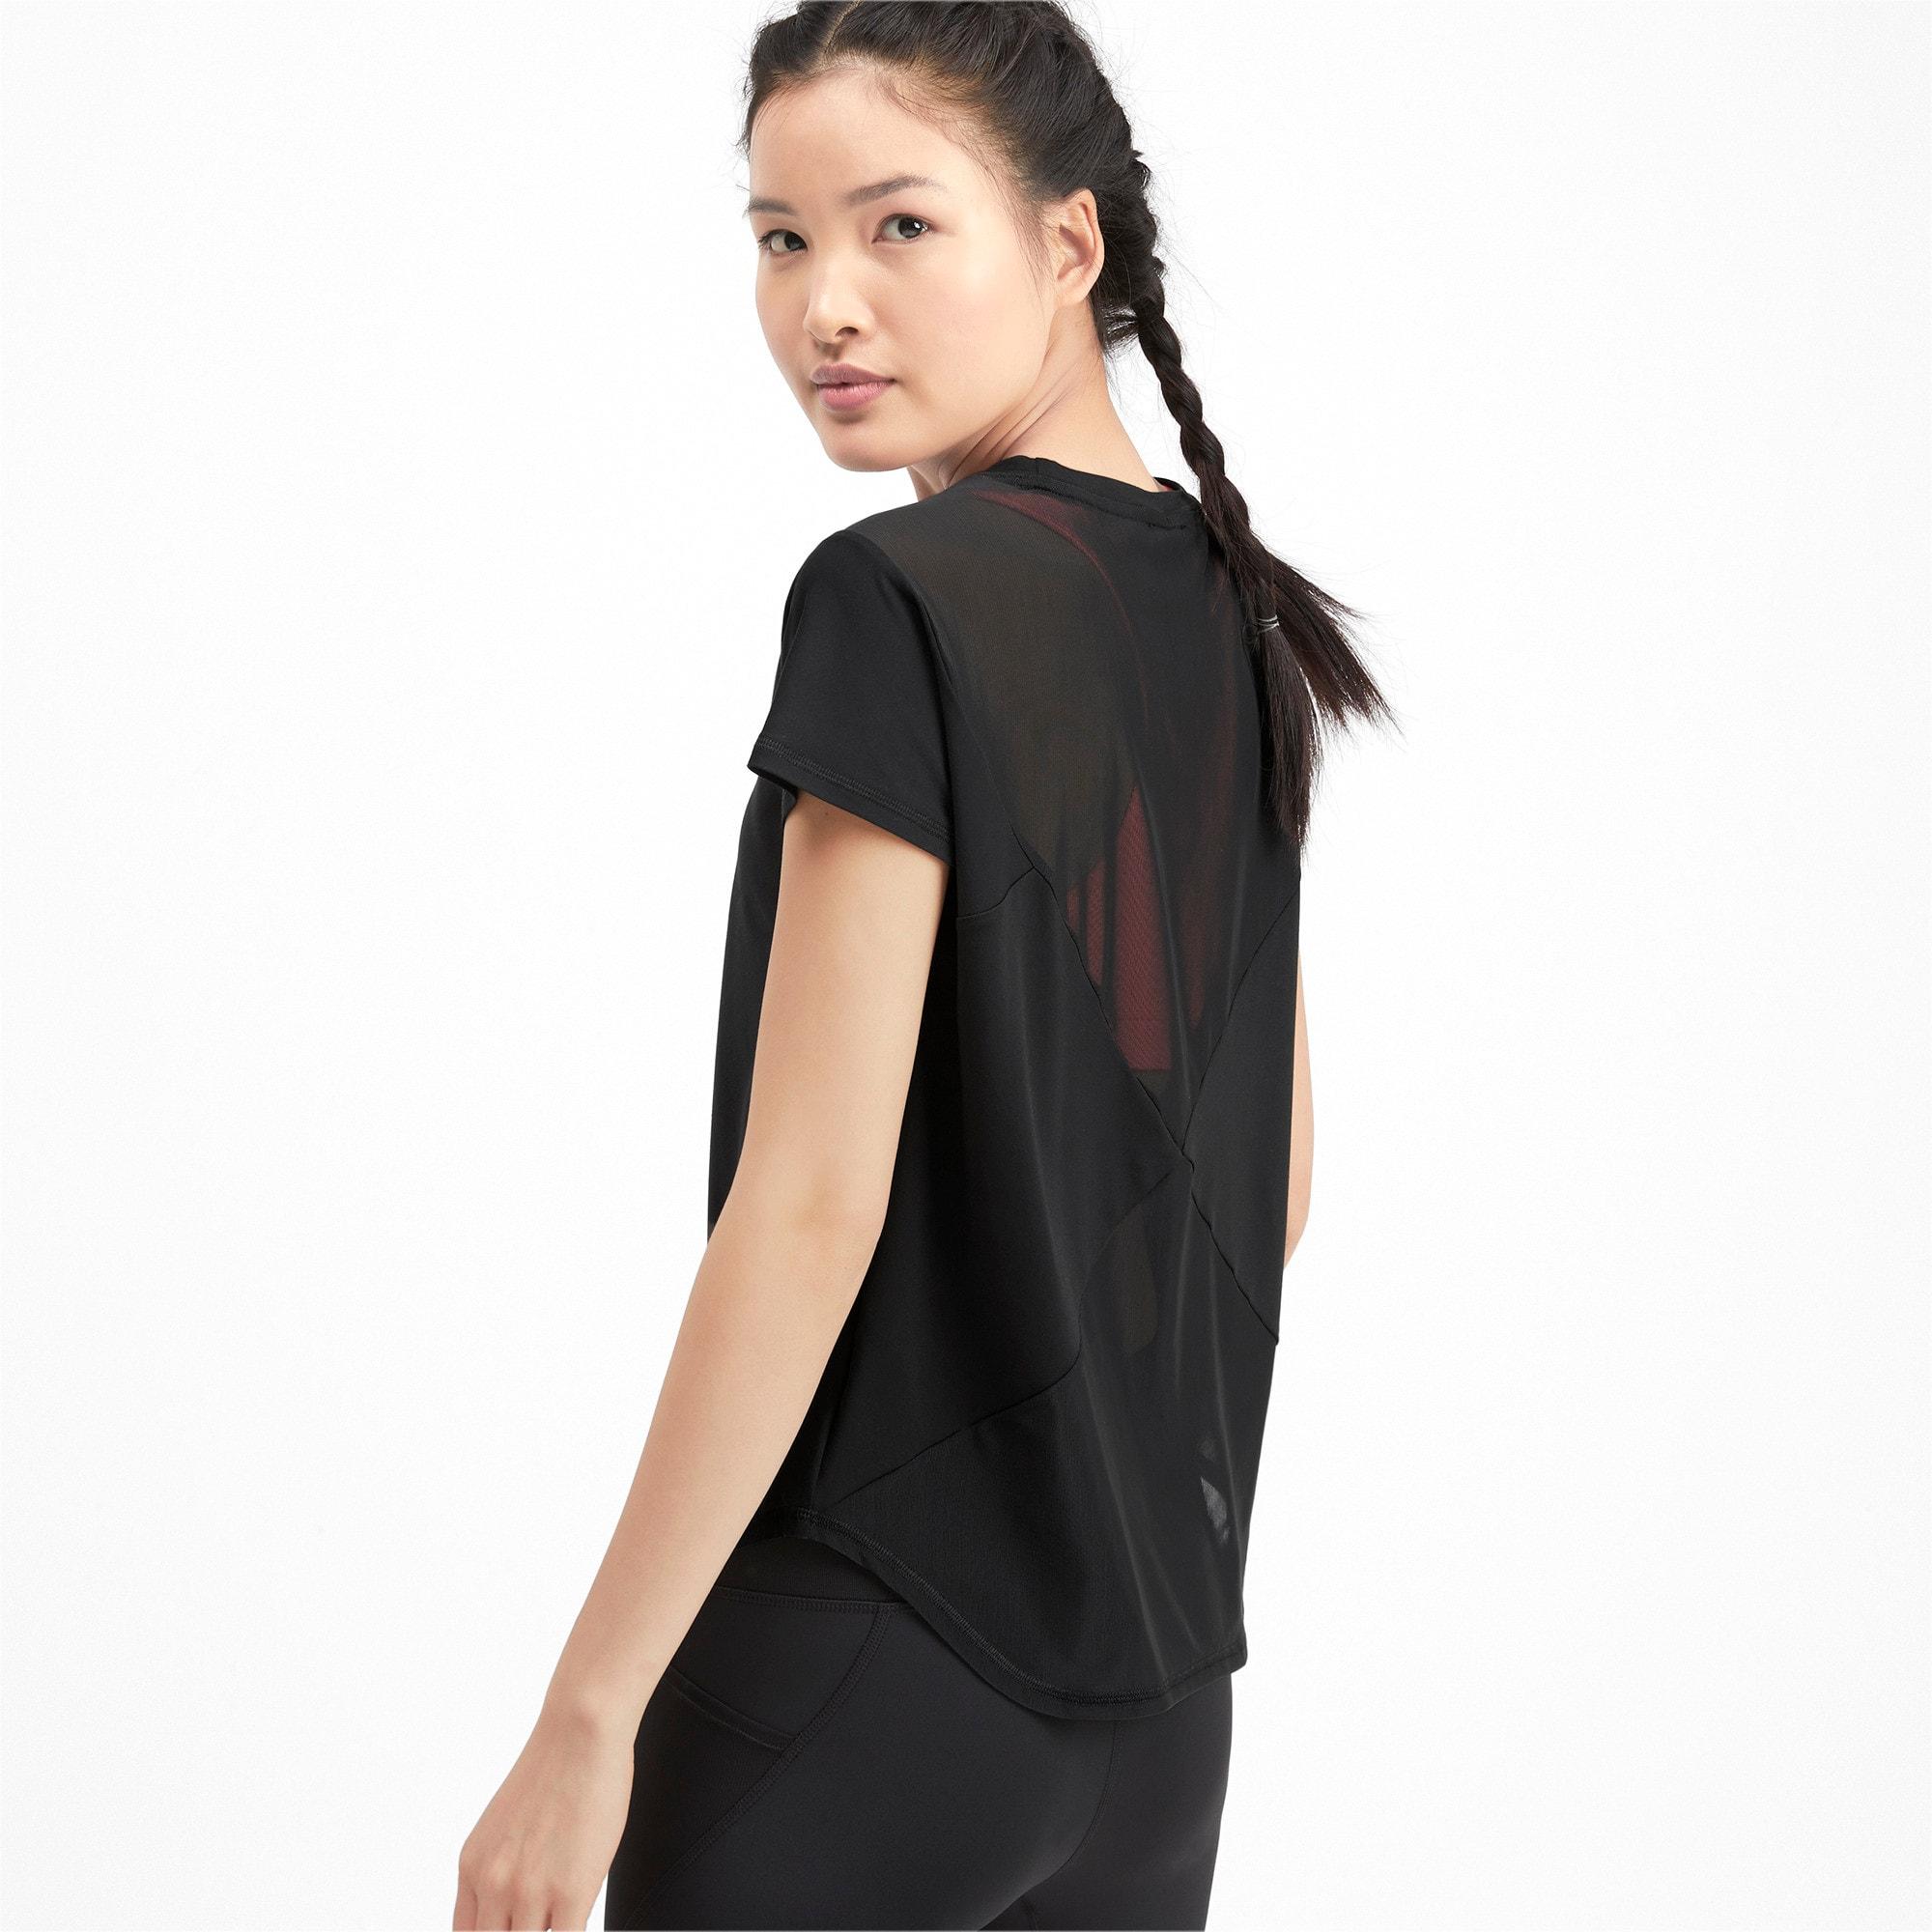 Thumbnail 2 of スタジオ SS メッシュ ウィメンズ トレーニング Tシャツ 半袖, Puma Black, medium-JPN